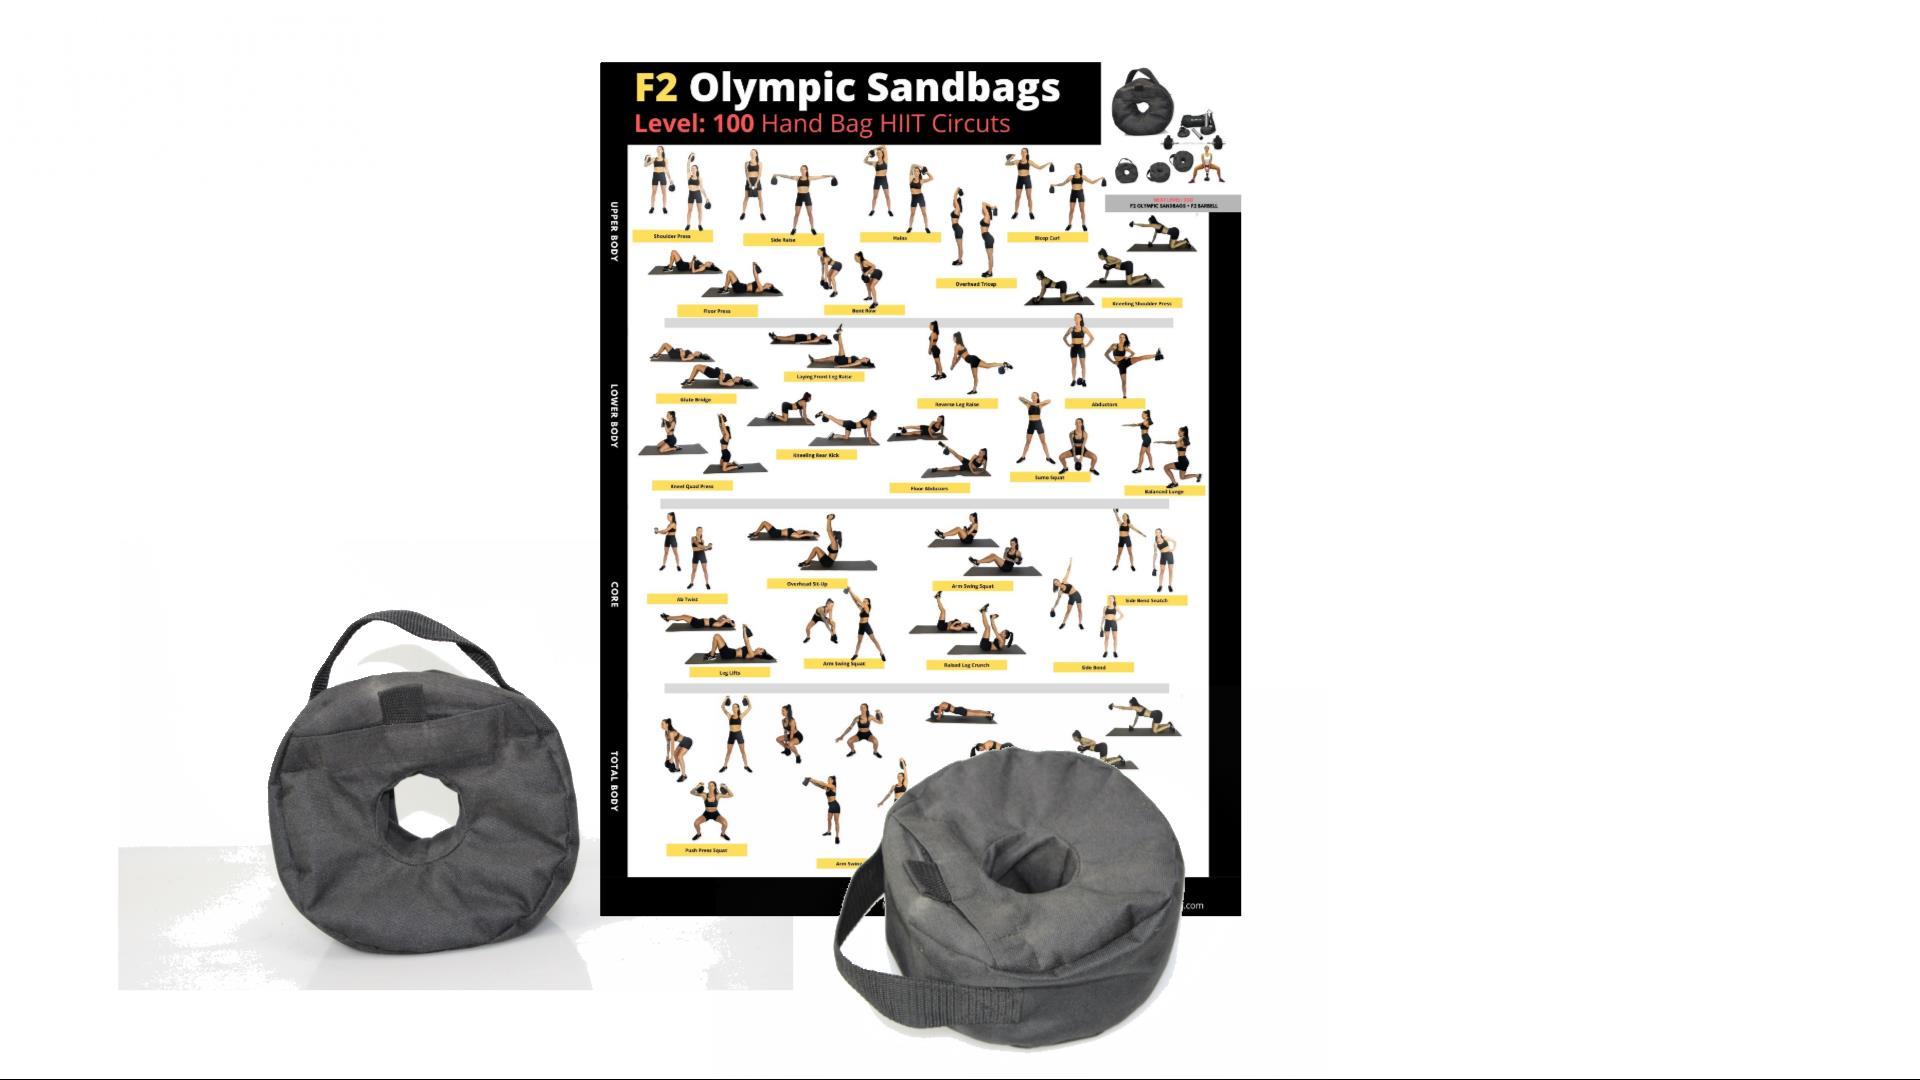 F2 Olympic Sandbags